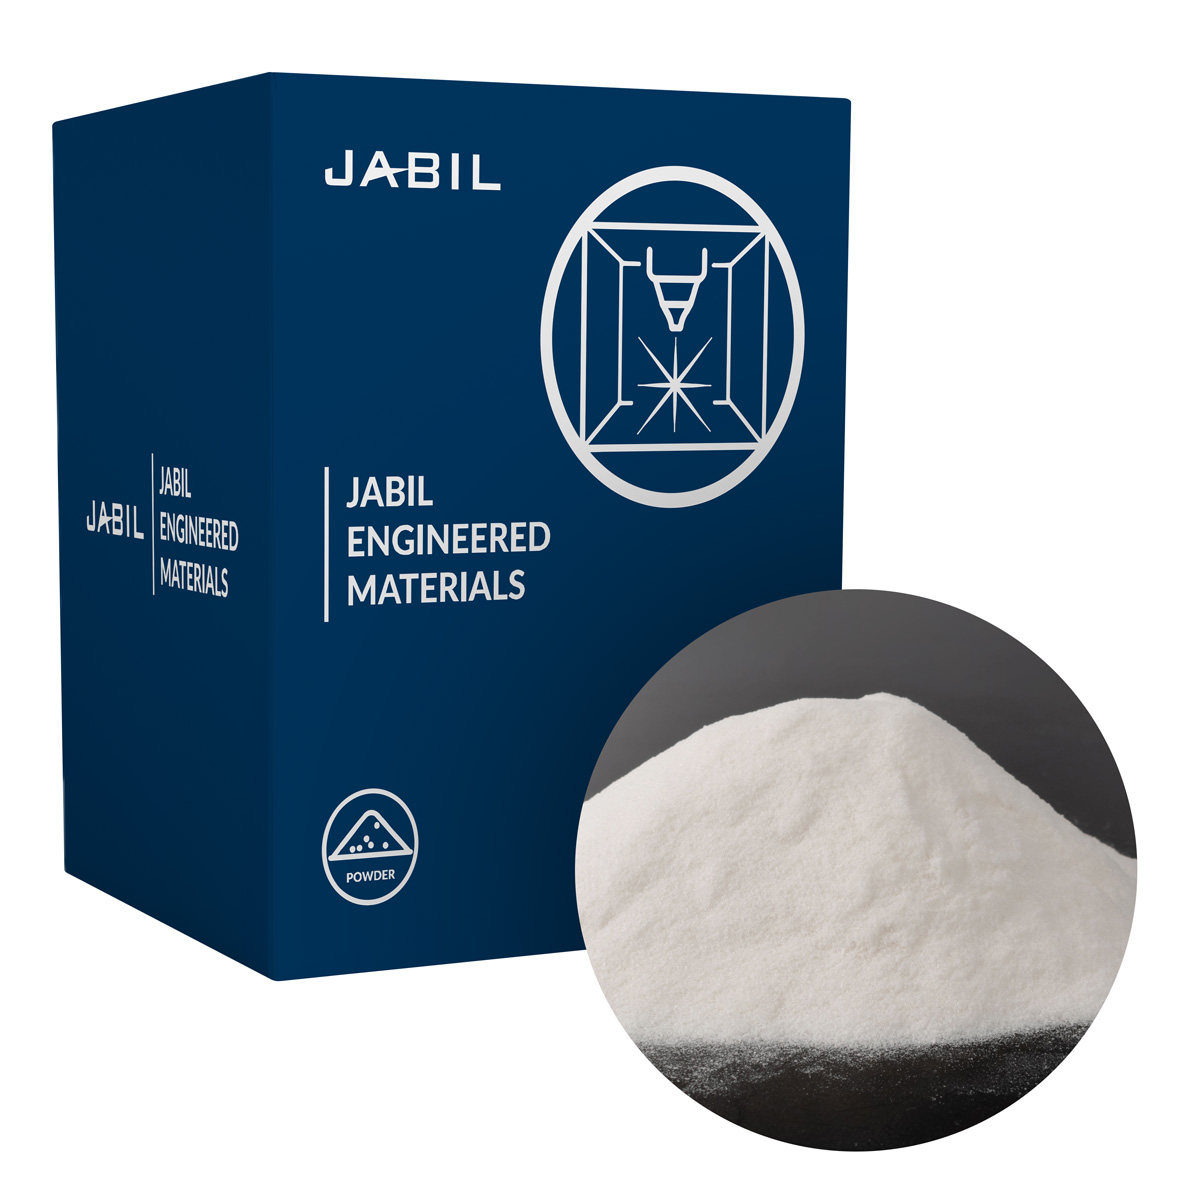 JABIL PA 4050 GB P NATURAL SPOOL